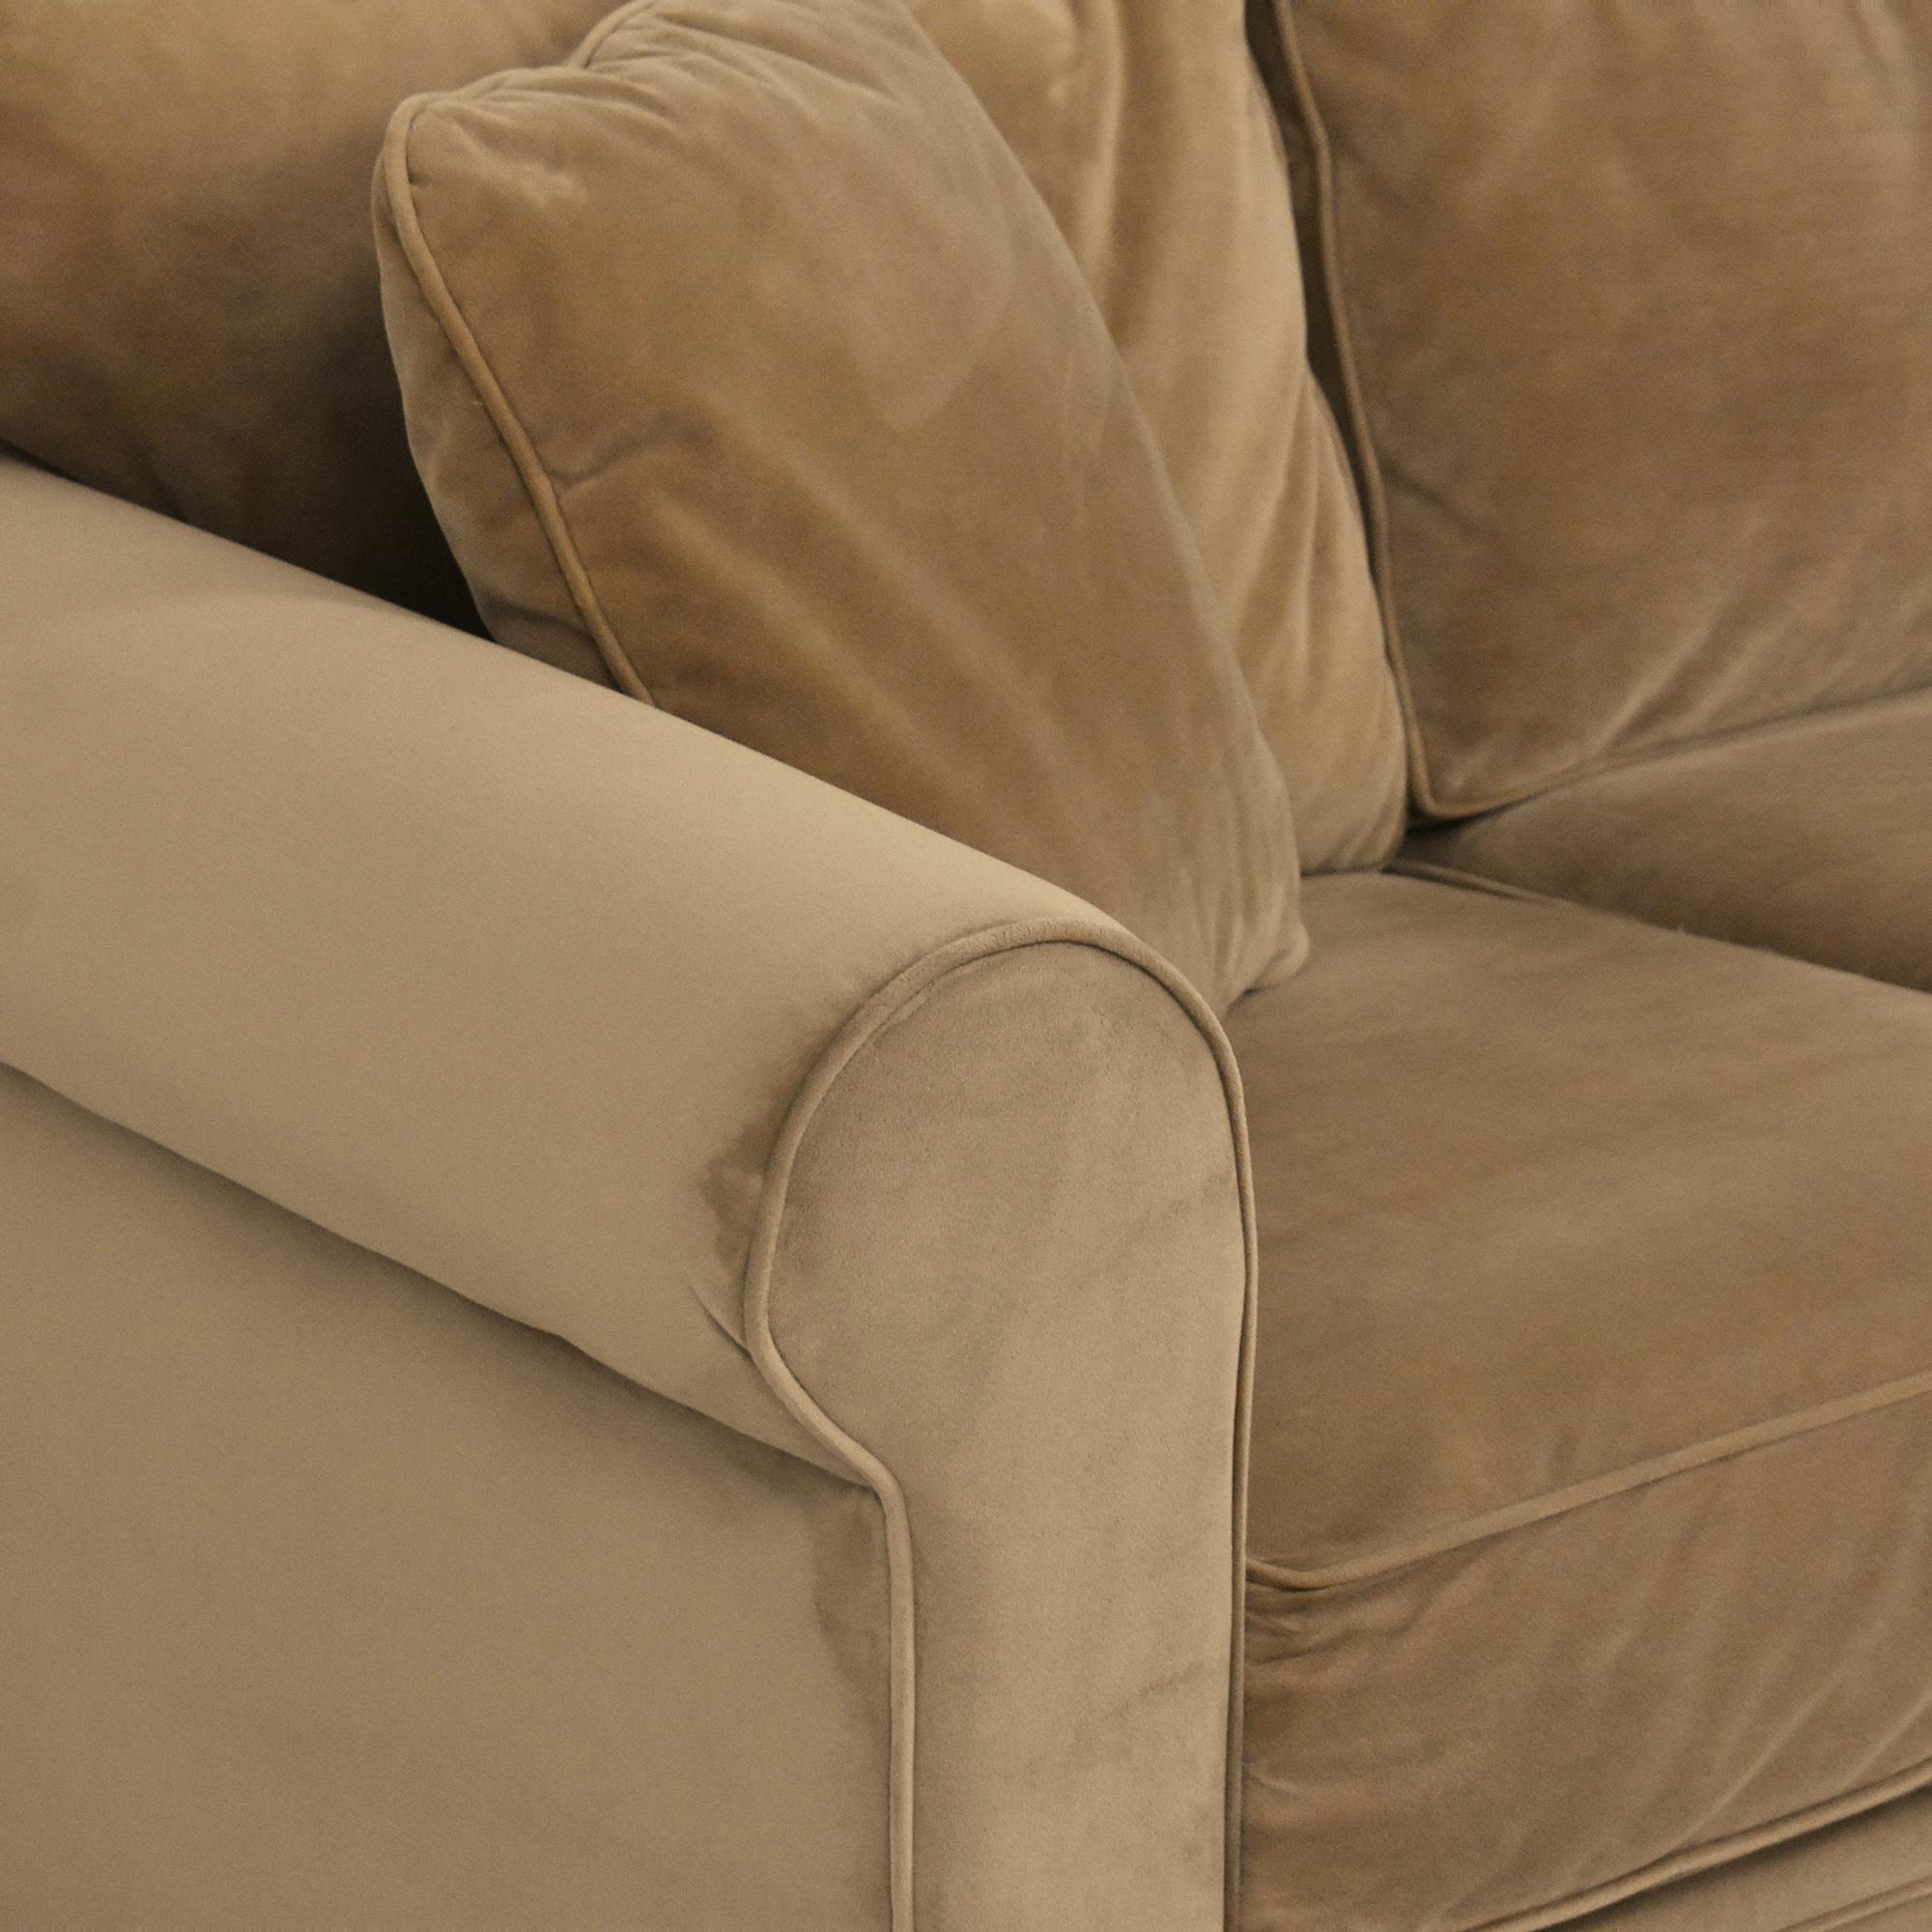 Macy's Roll Arm Sofa / Sofas